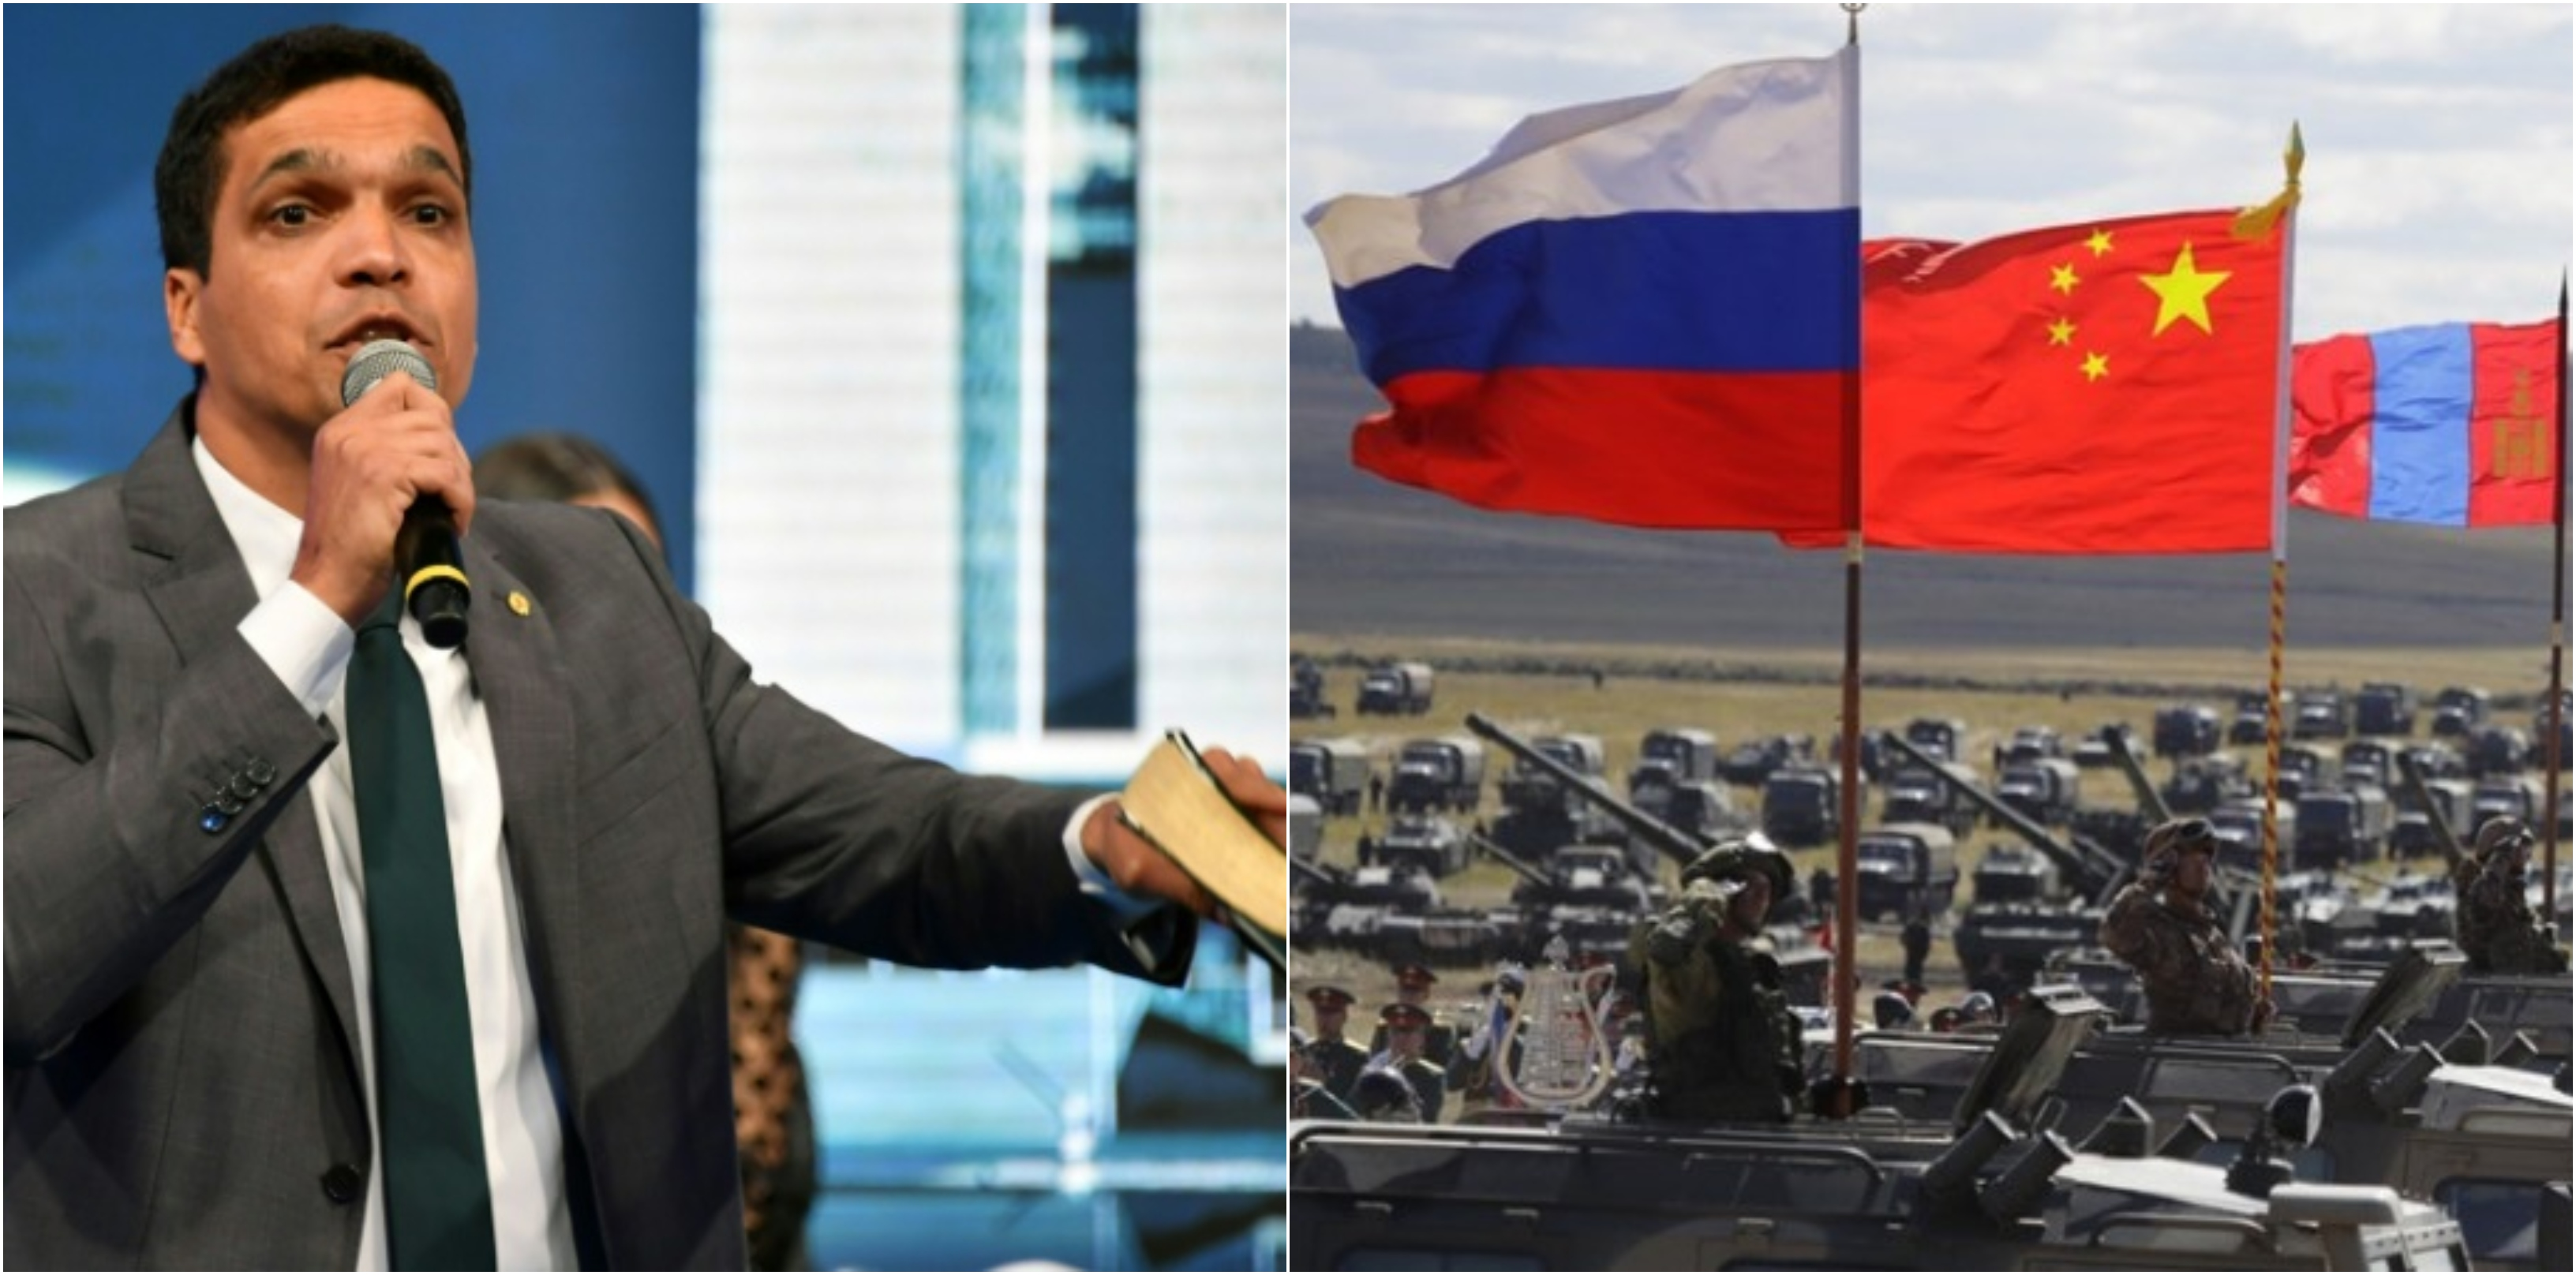 Guerra Vostok pode ser mundial? Veja se a fala de Daciolo é verdadeira